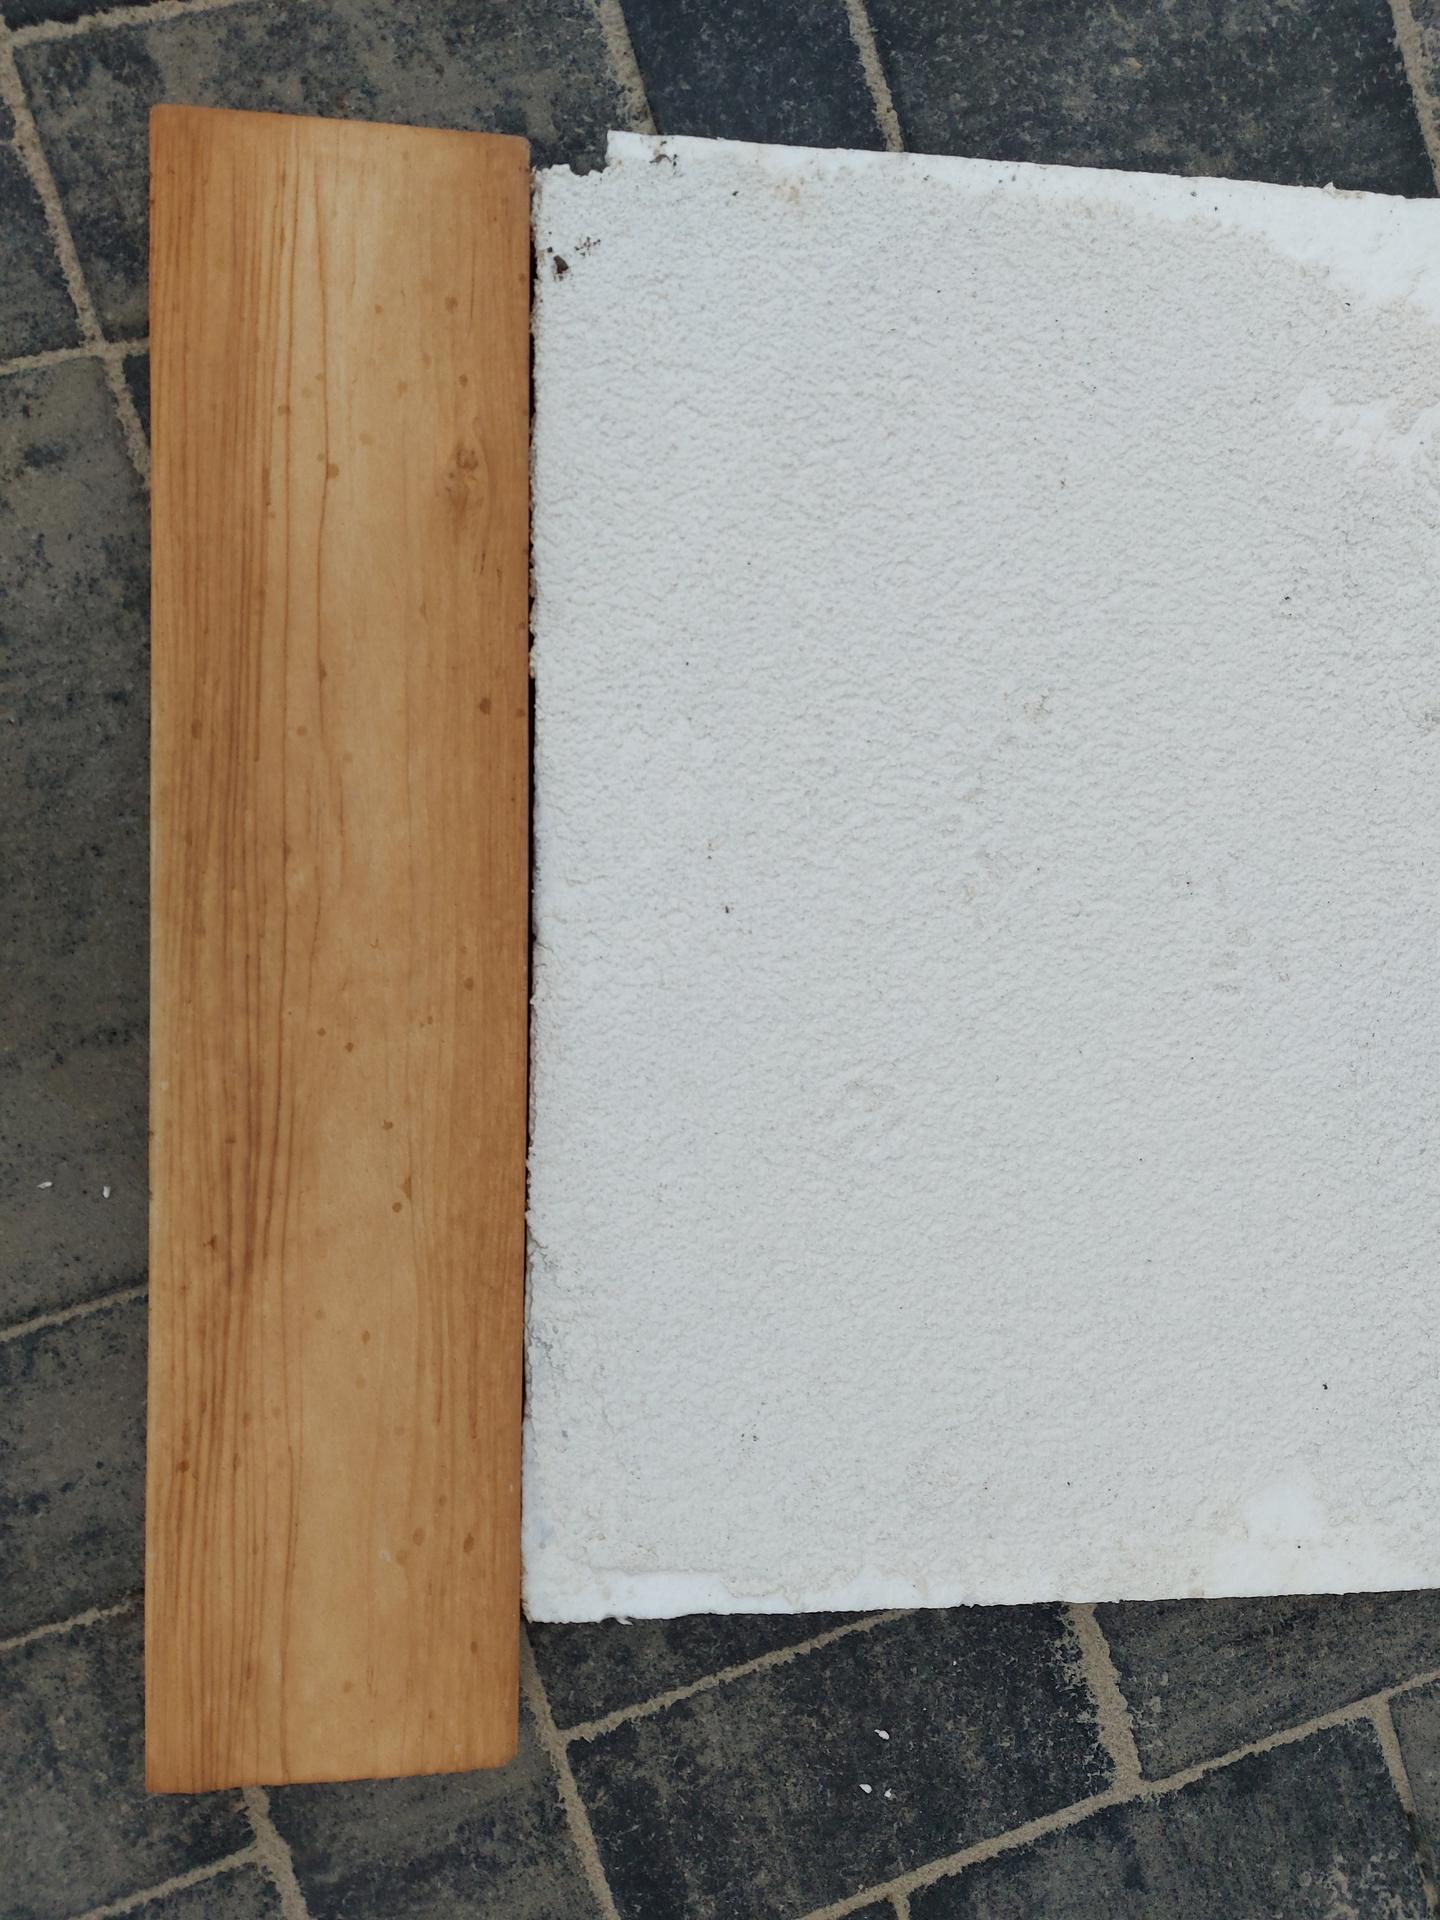 Bungalov s plochou střechou - Vzorek fasady a betonoveho obkladu